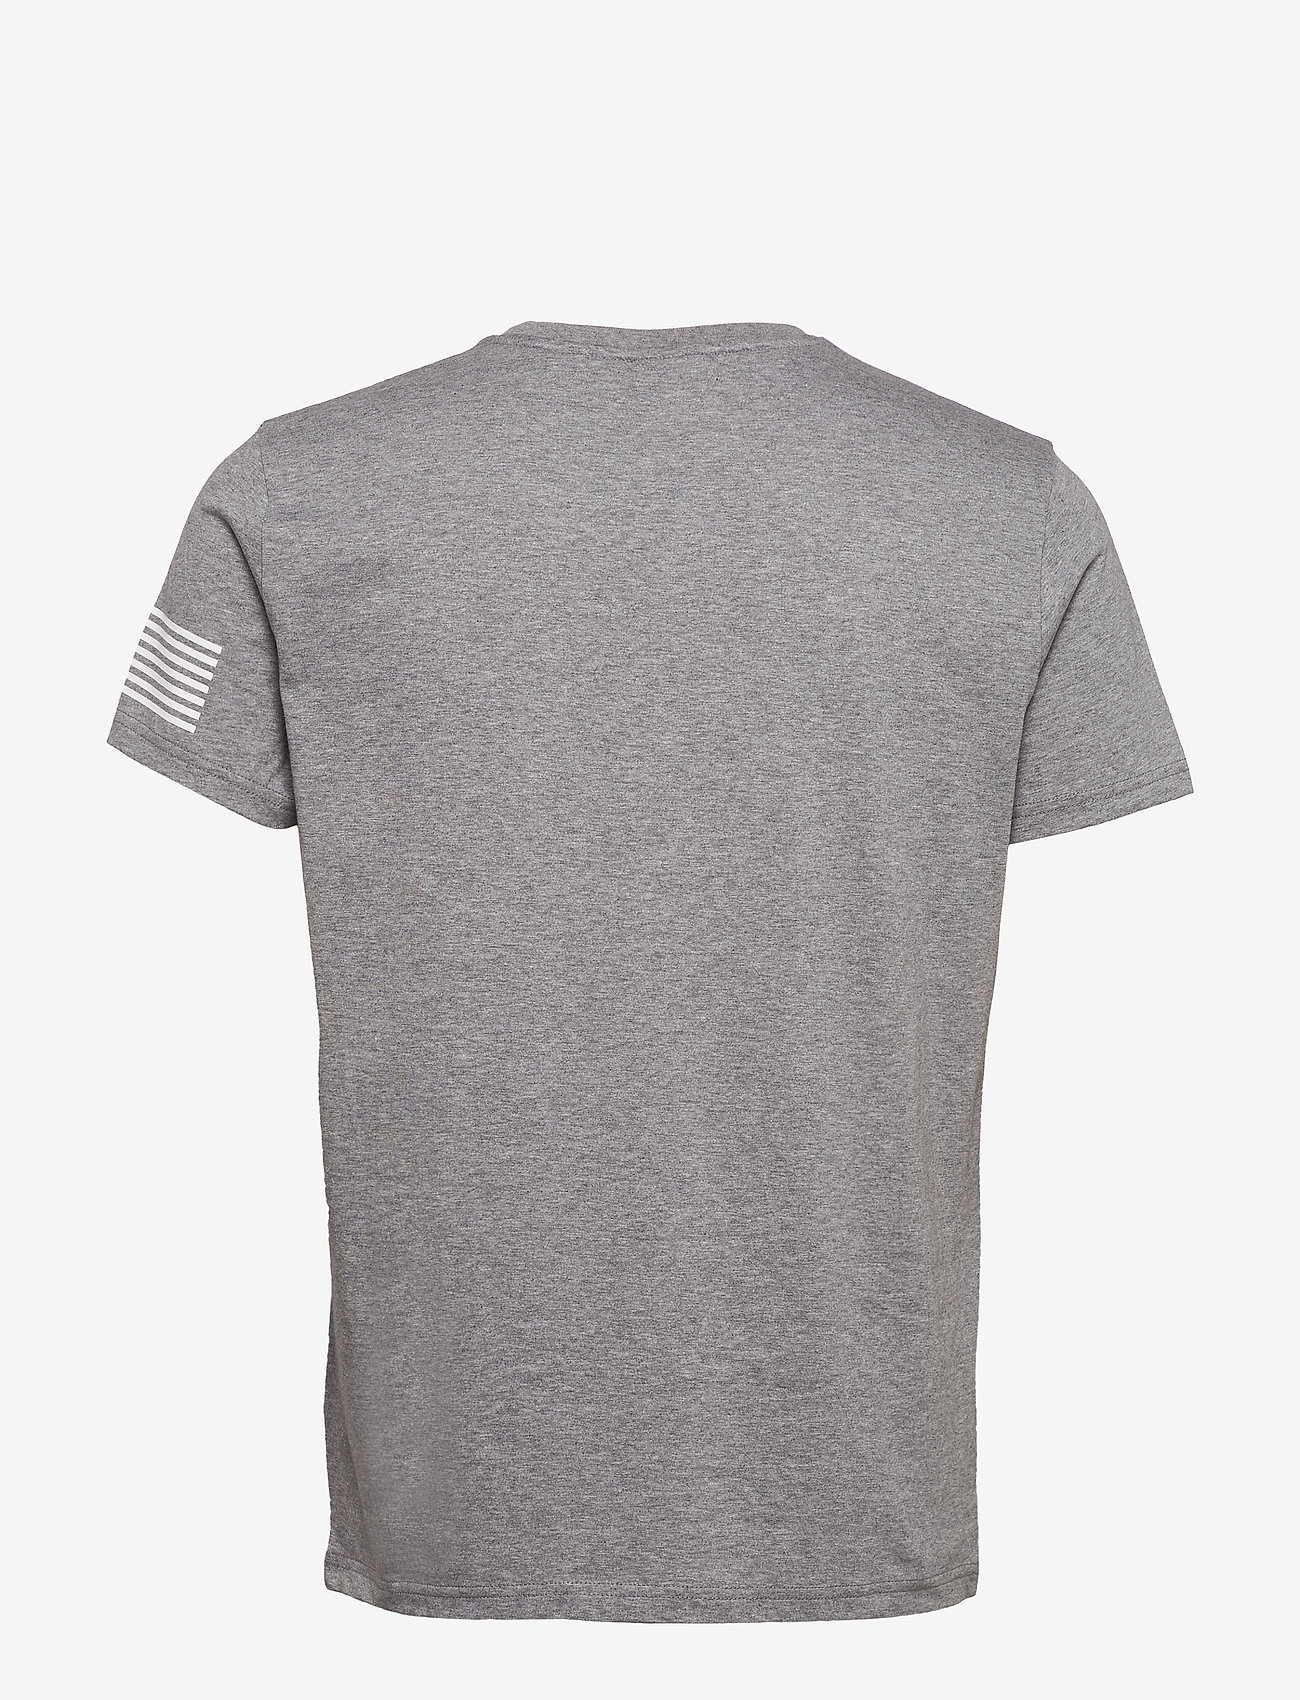 GANT - D1. 13 STRIPES SS T-SHIRT - short-sleeved t-shirts - grey melange - 1